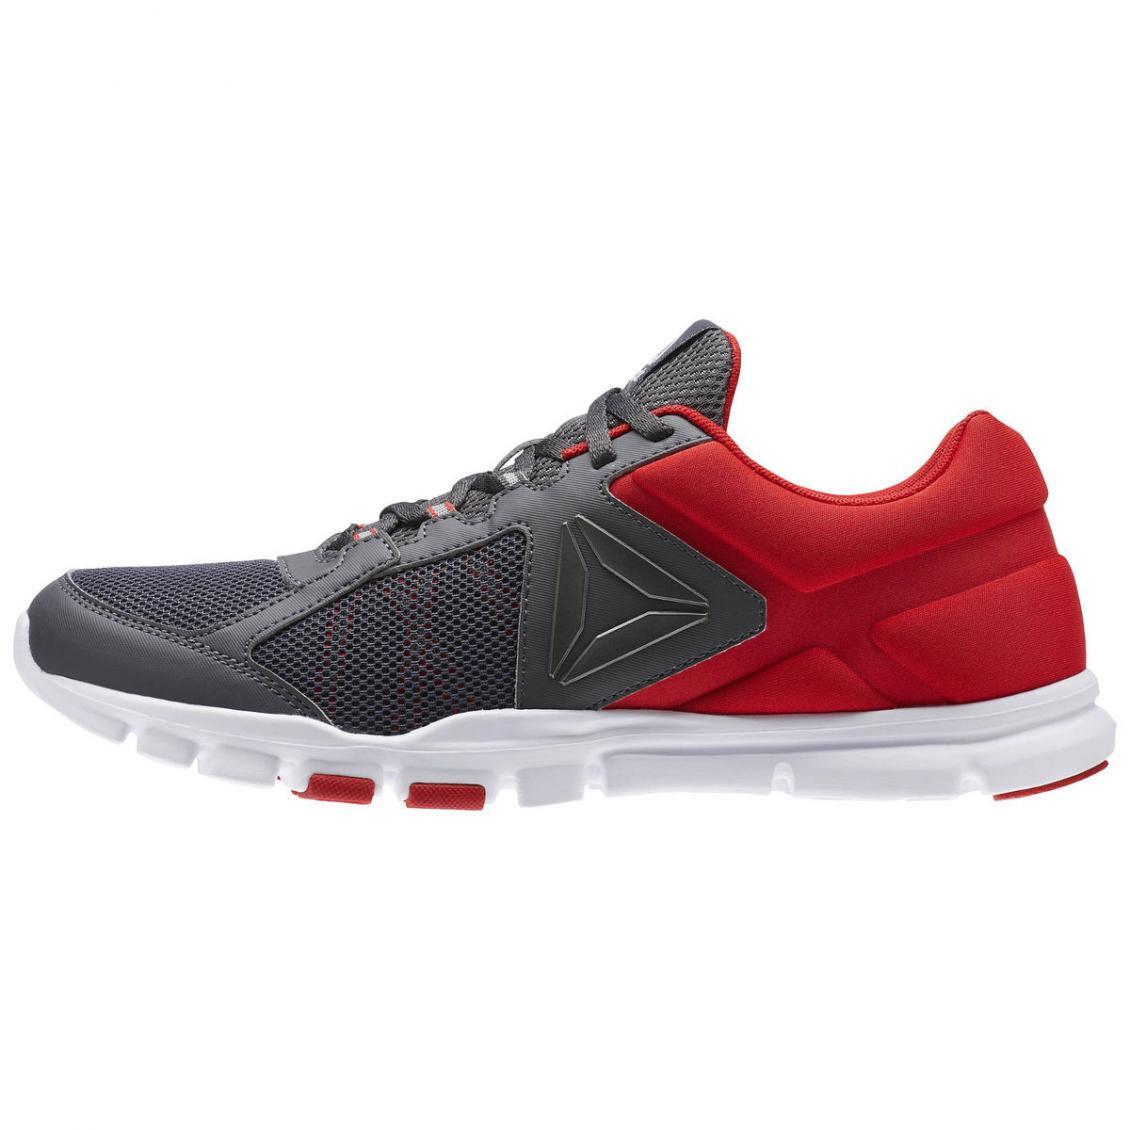 Red – Reebok Yourflex Train 9.0 MT Mens Primal Red / Ash Grey / White